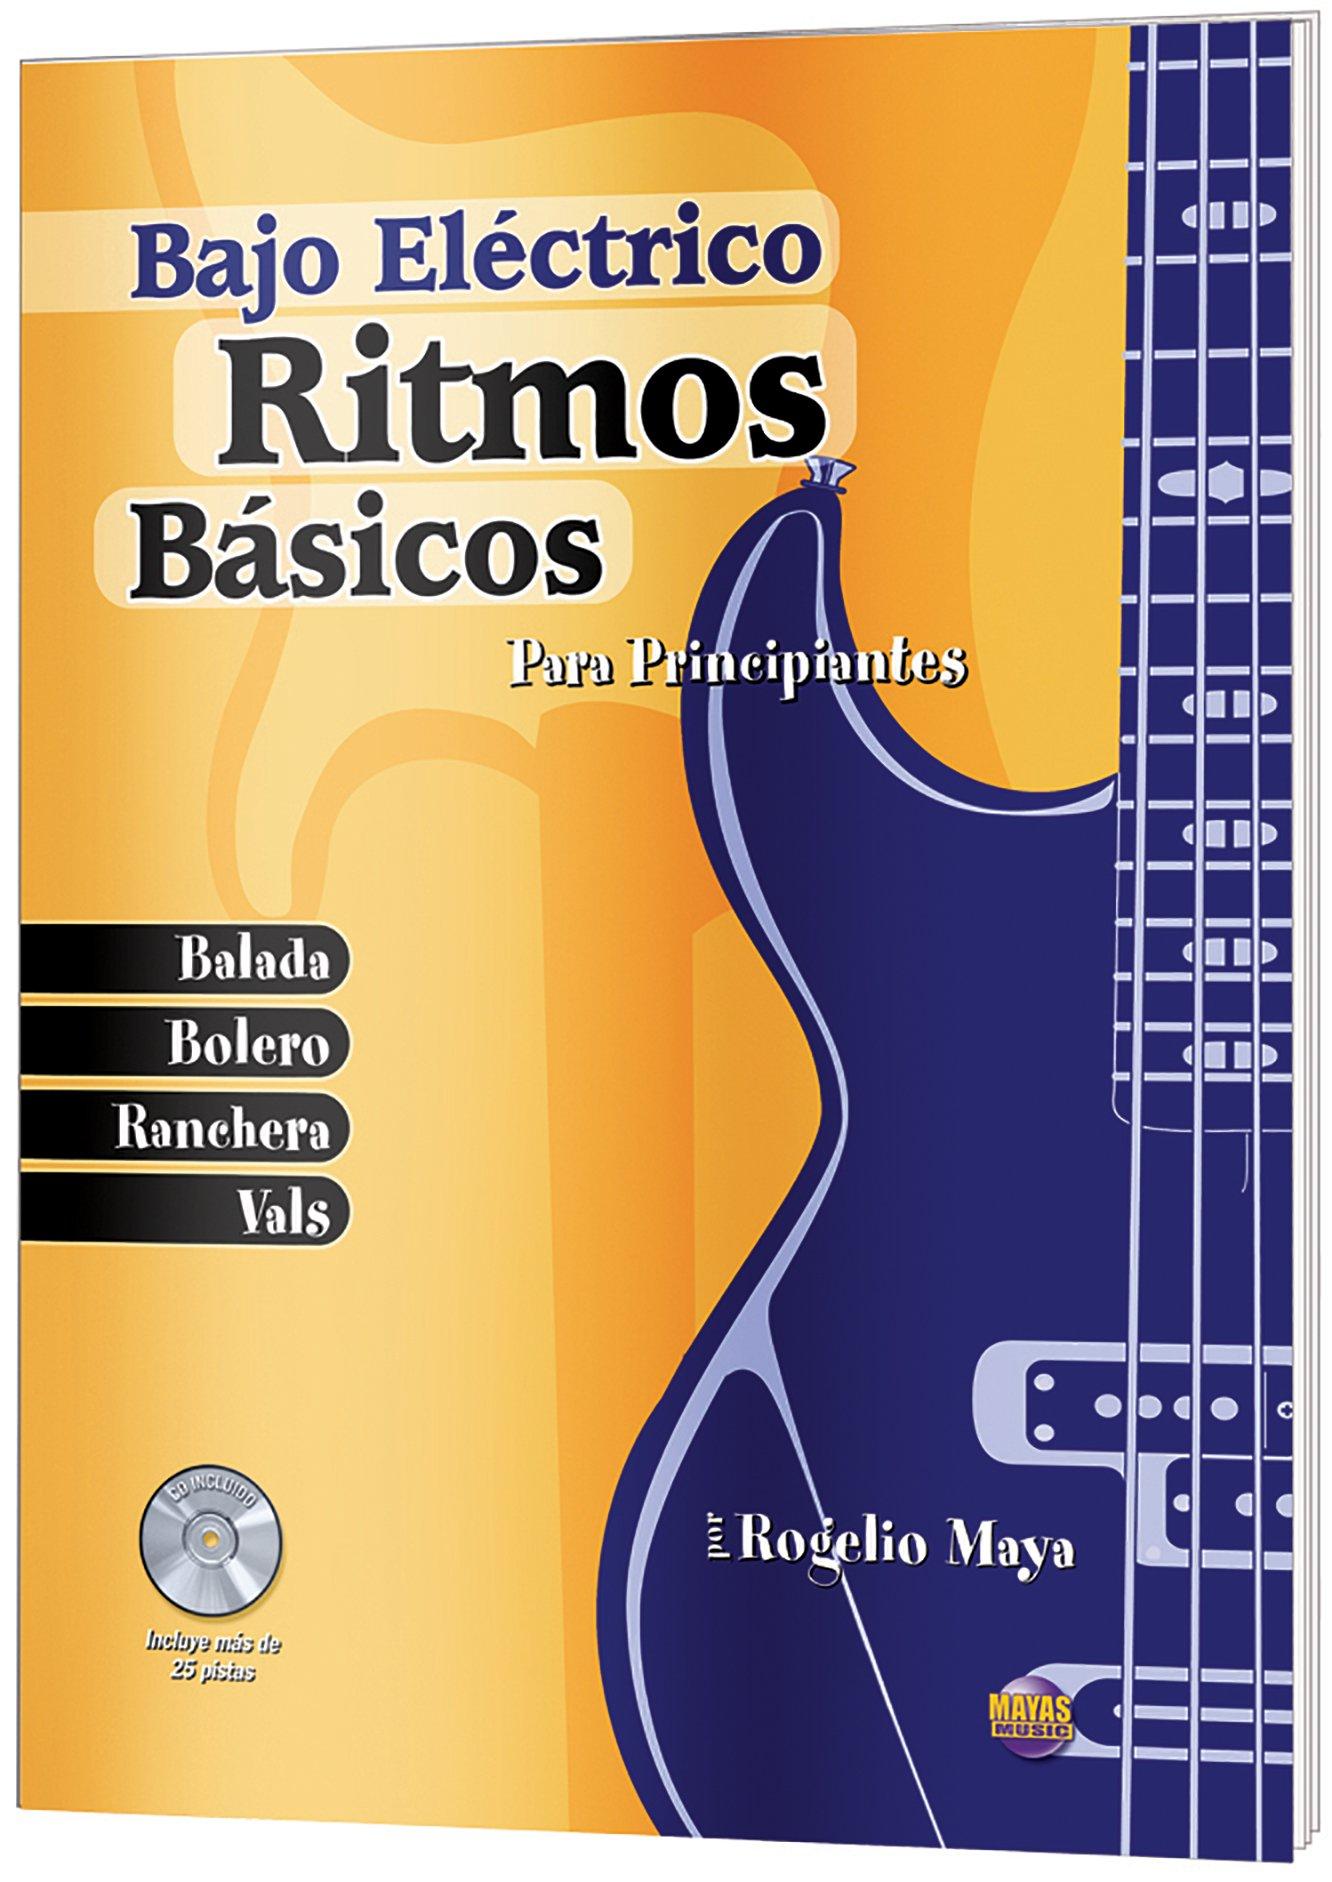 Ritmos Basicos - Bajo Electrico: Para Principiantes Spanish ...